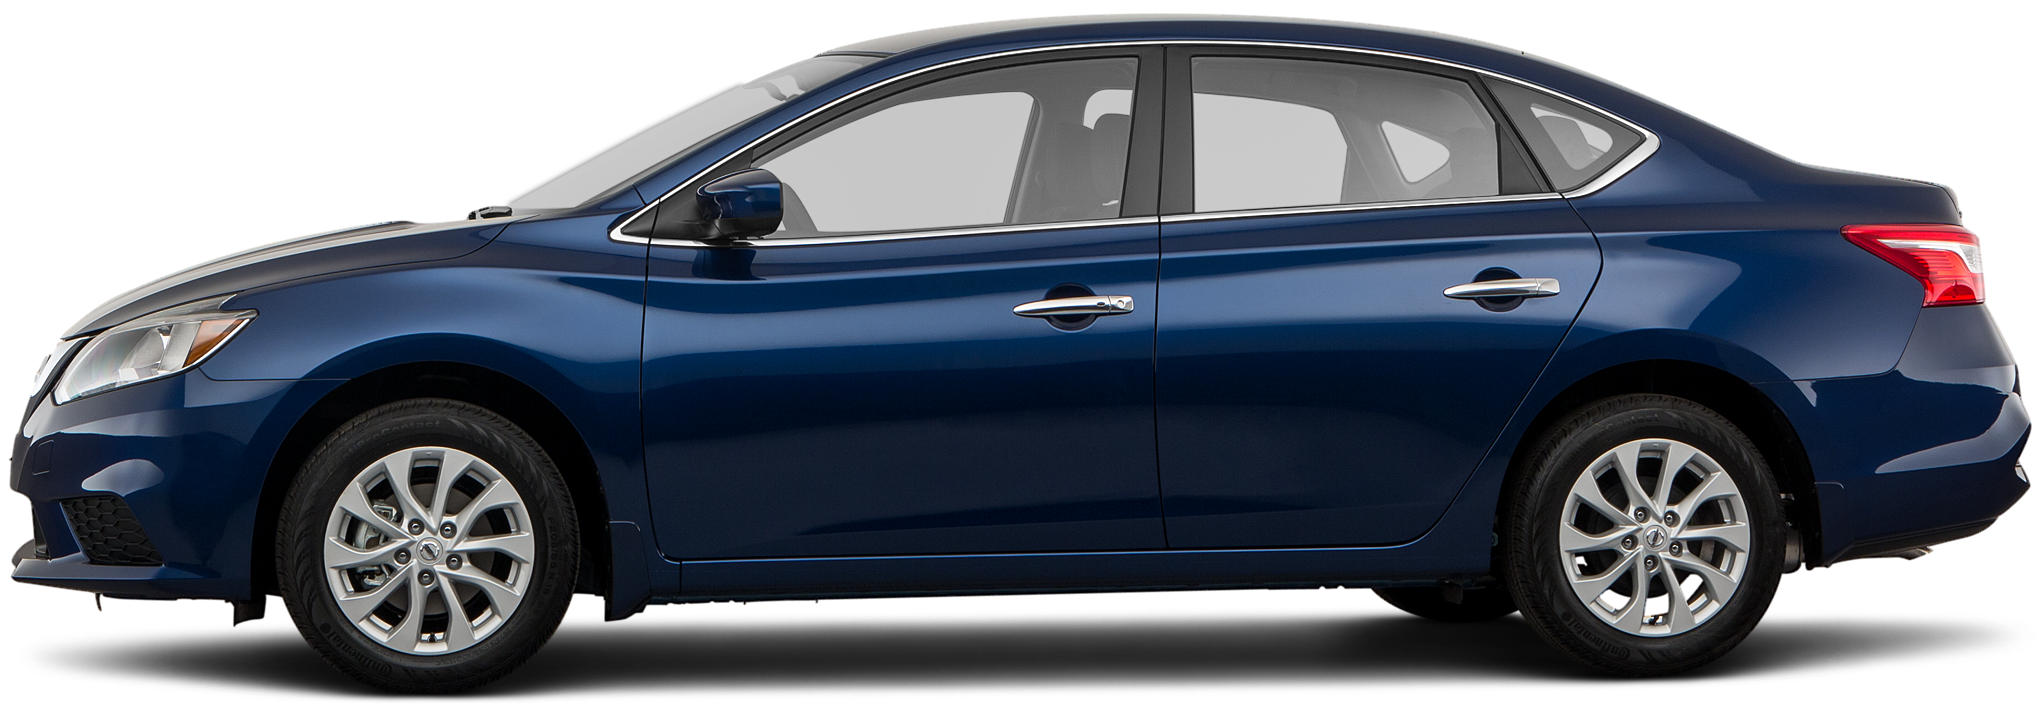 2019 Nissan Sentra Sedan 1.8 SV